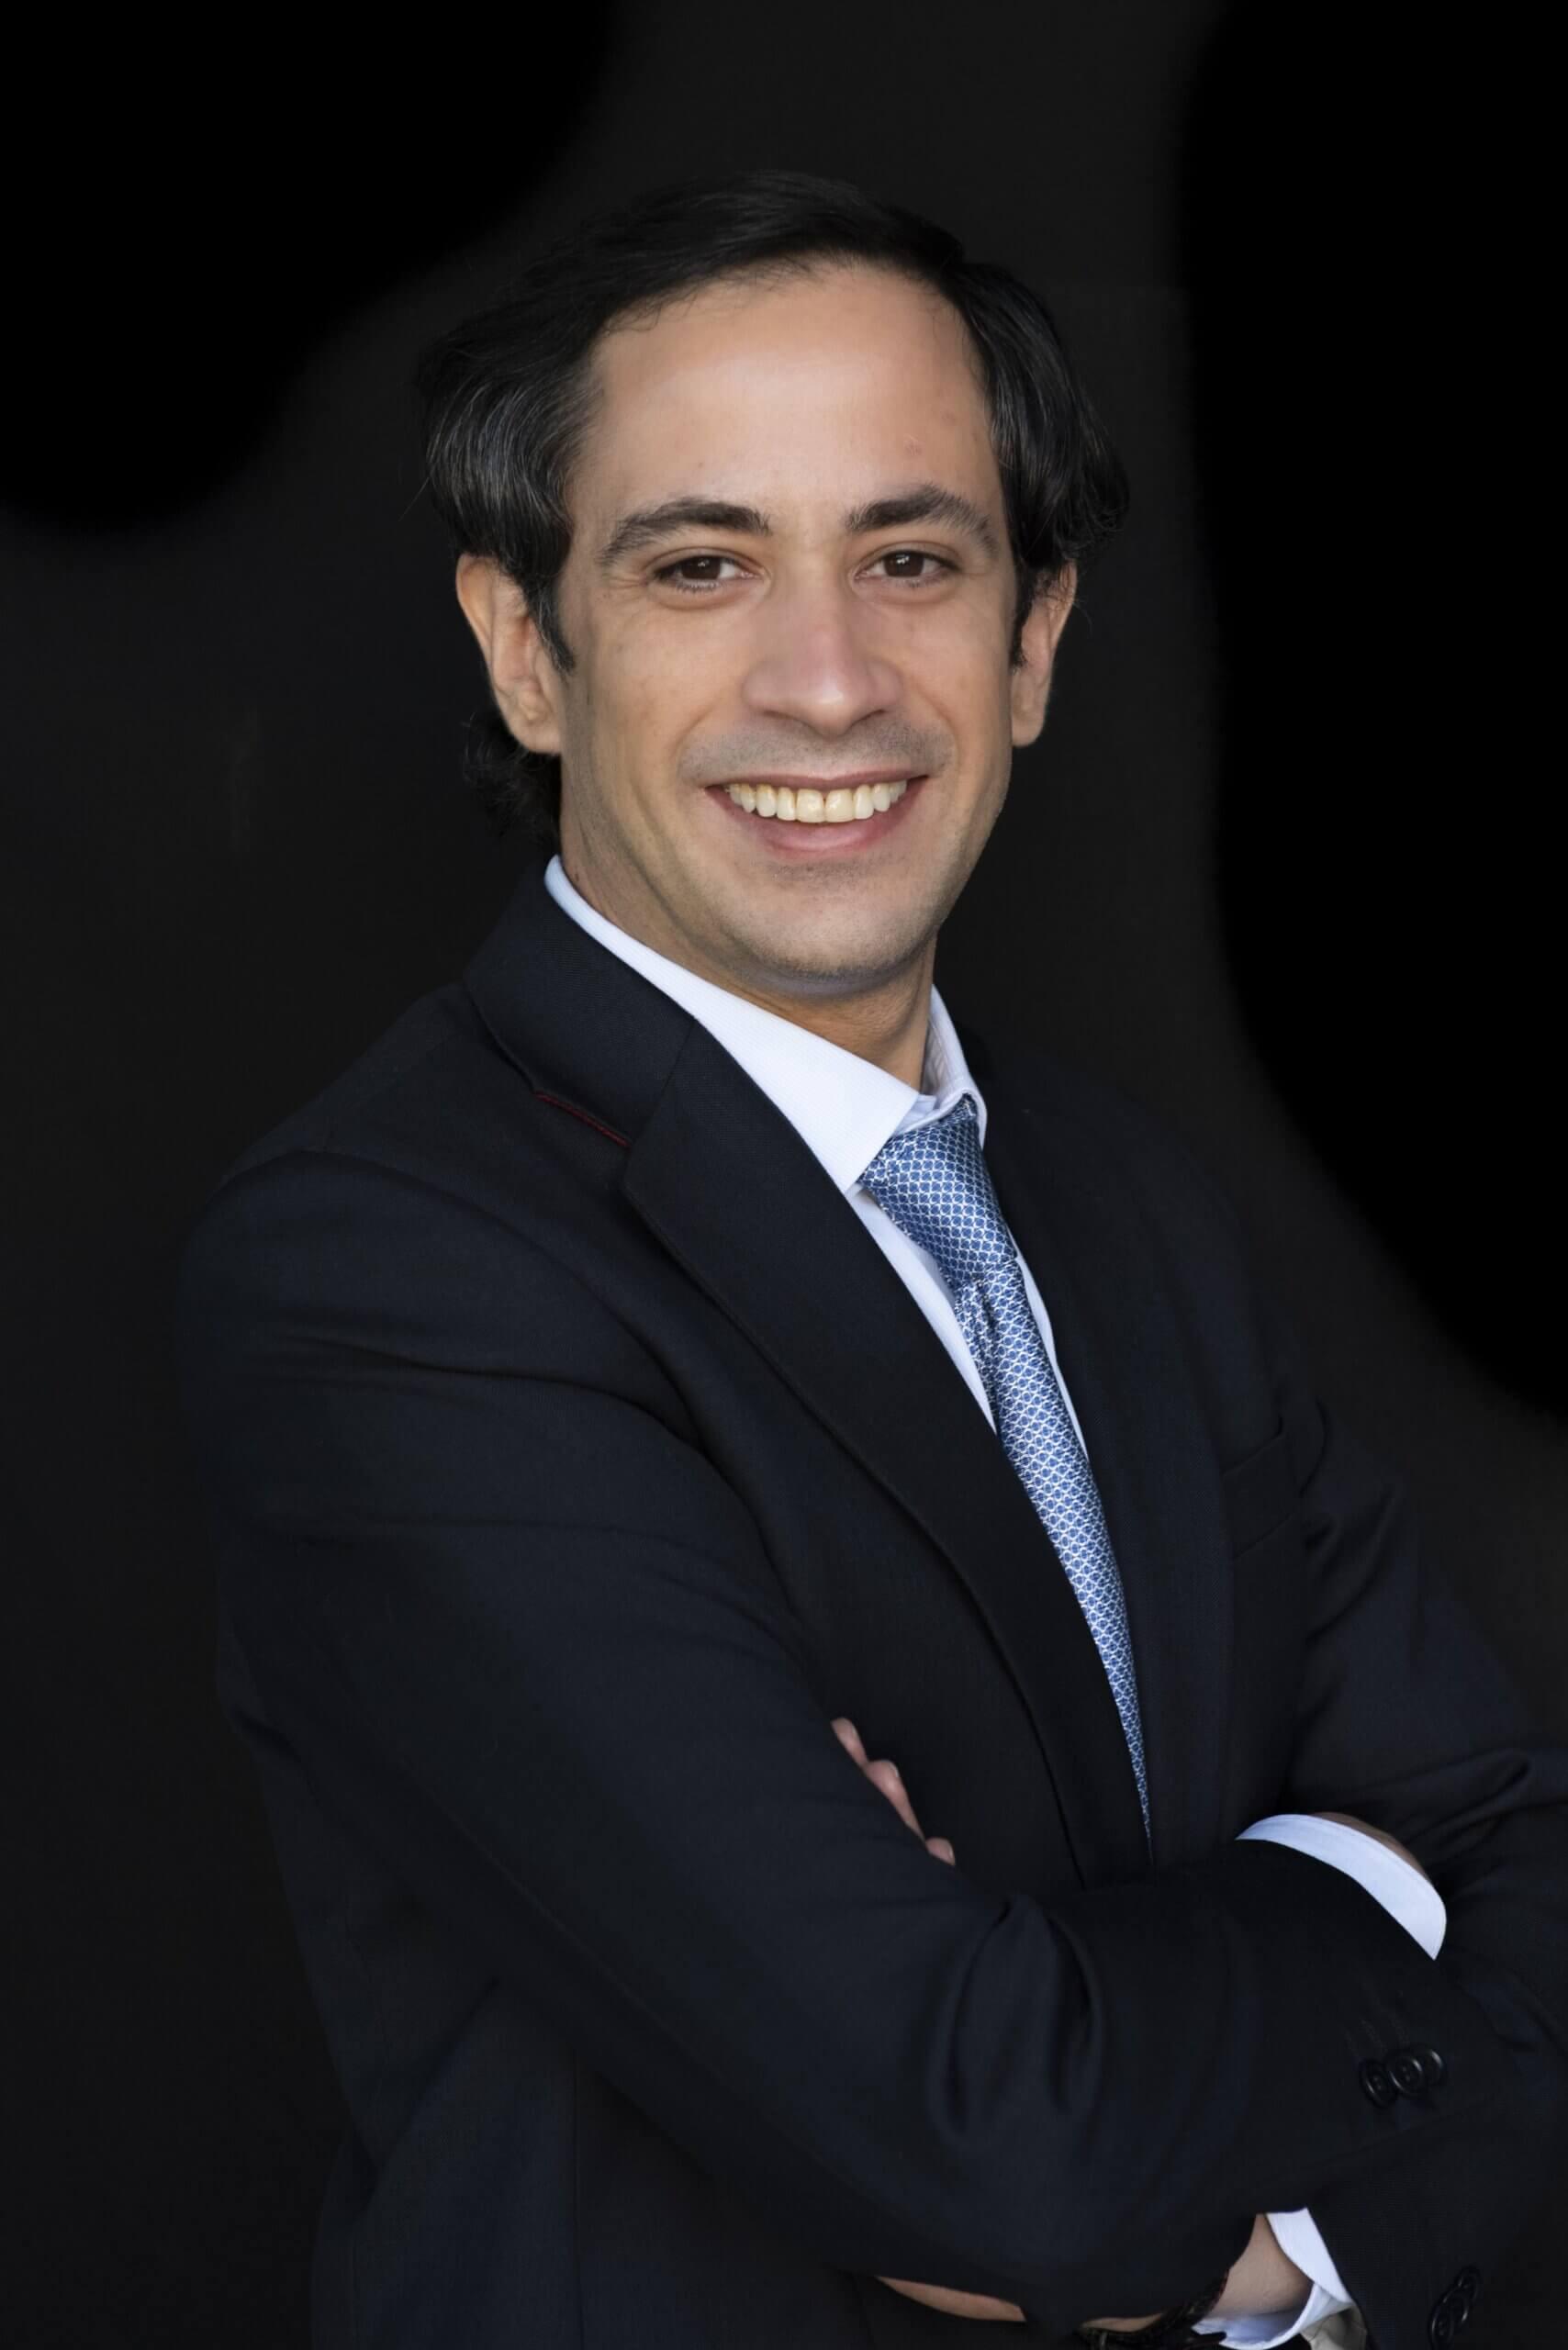 Ramón Fernández Izquierdo